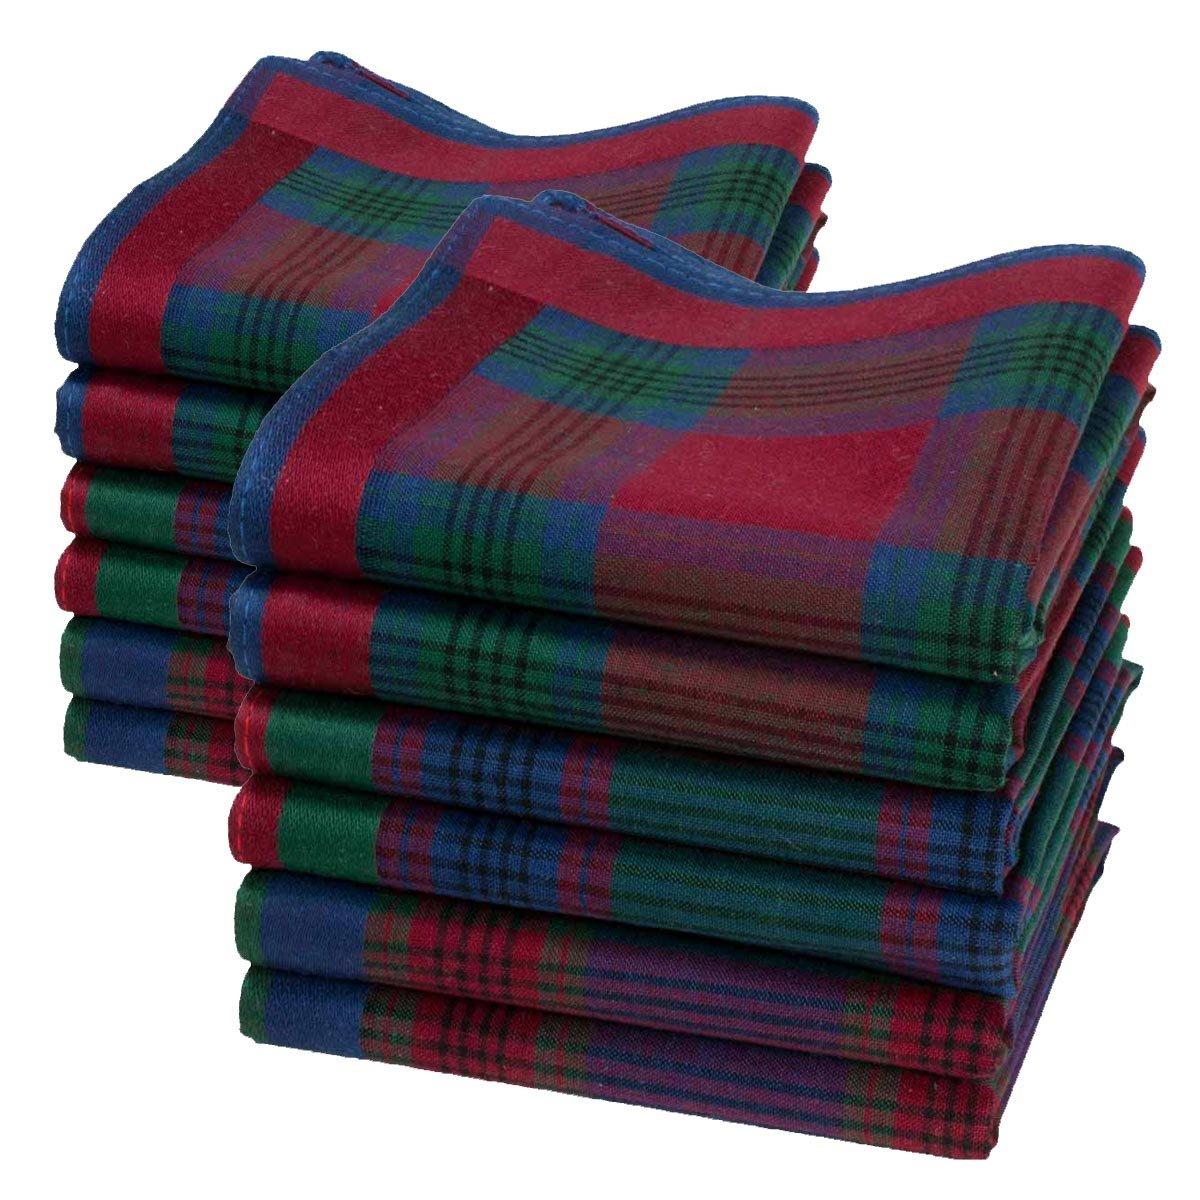 Man Jules hankerchief - Size 16 square - 6 units Merrysquare